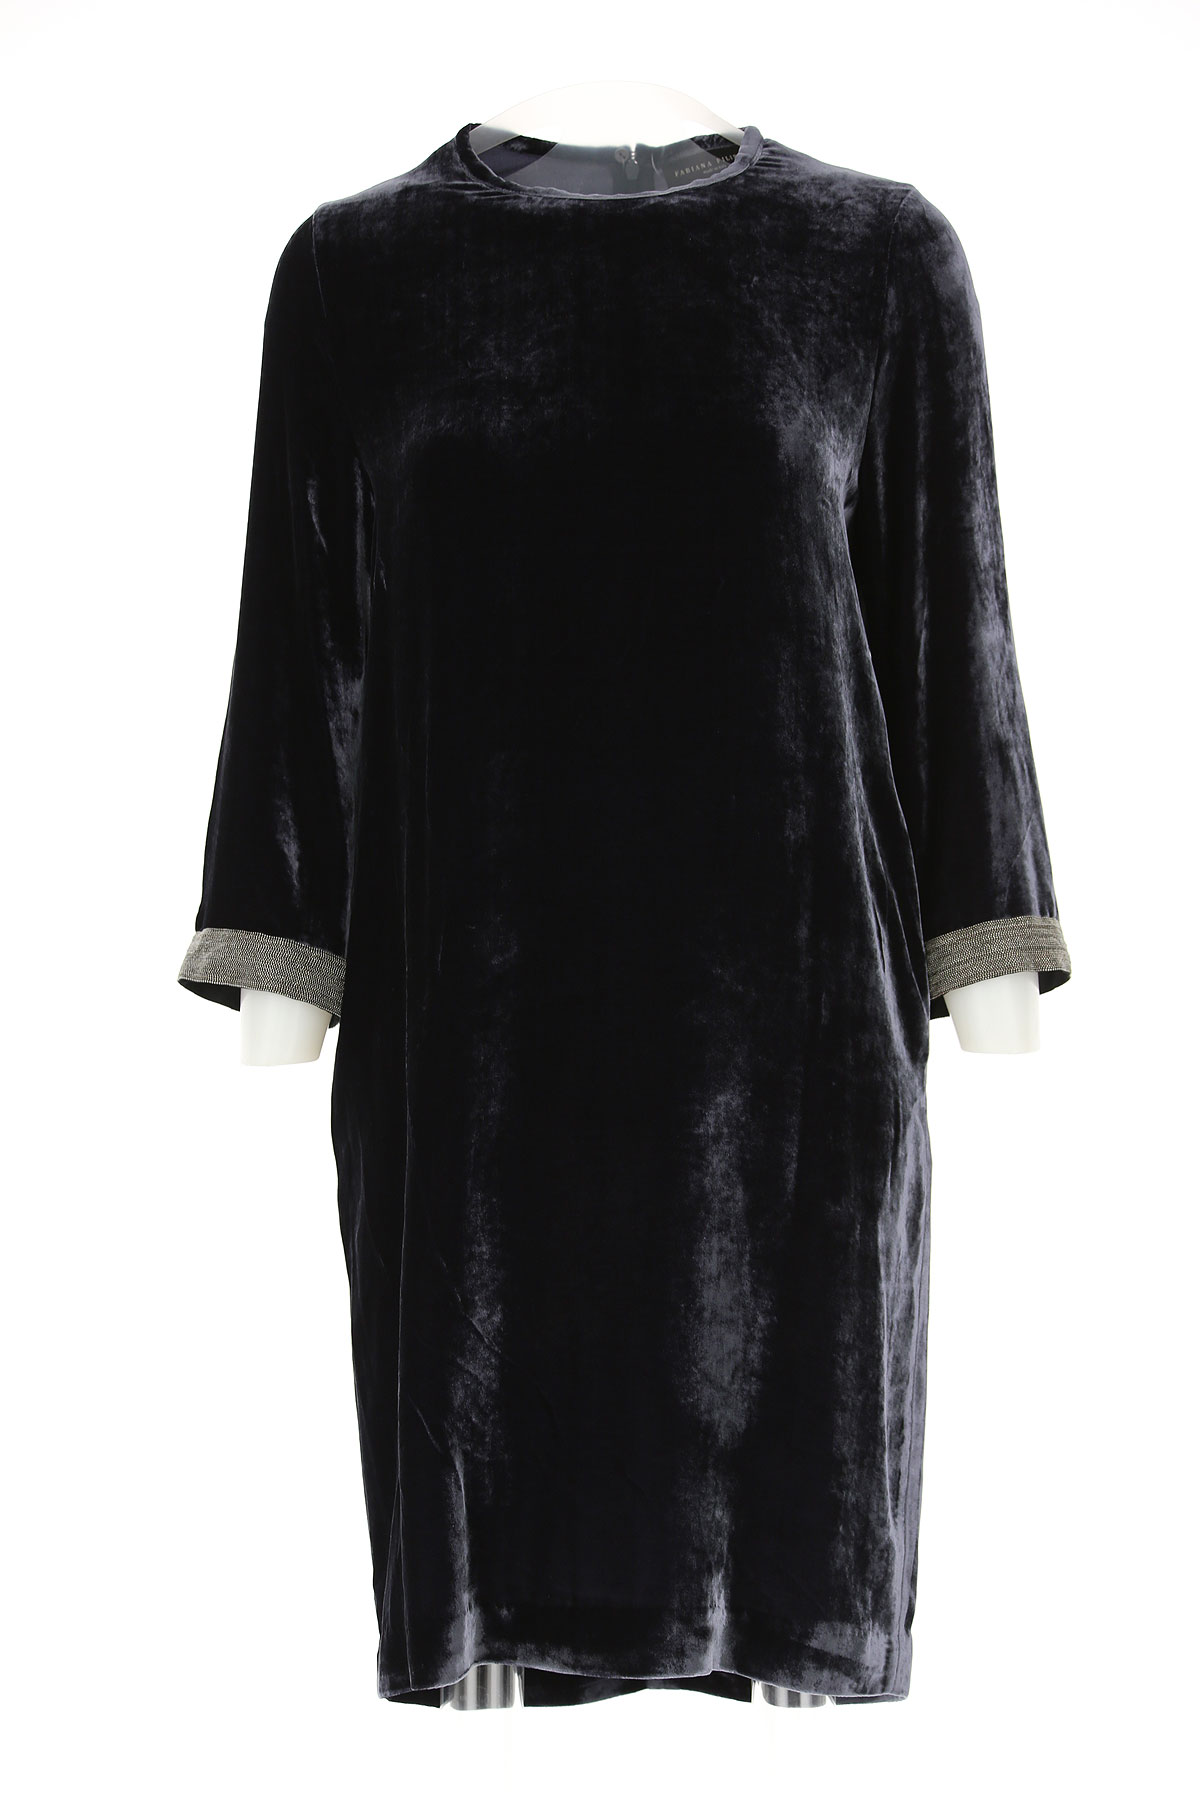 Image of Fabiana Filippi Dress for Women, Evening Cocktail Party, navy, Viscose, 2017, 4 6